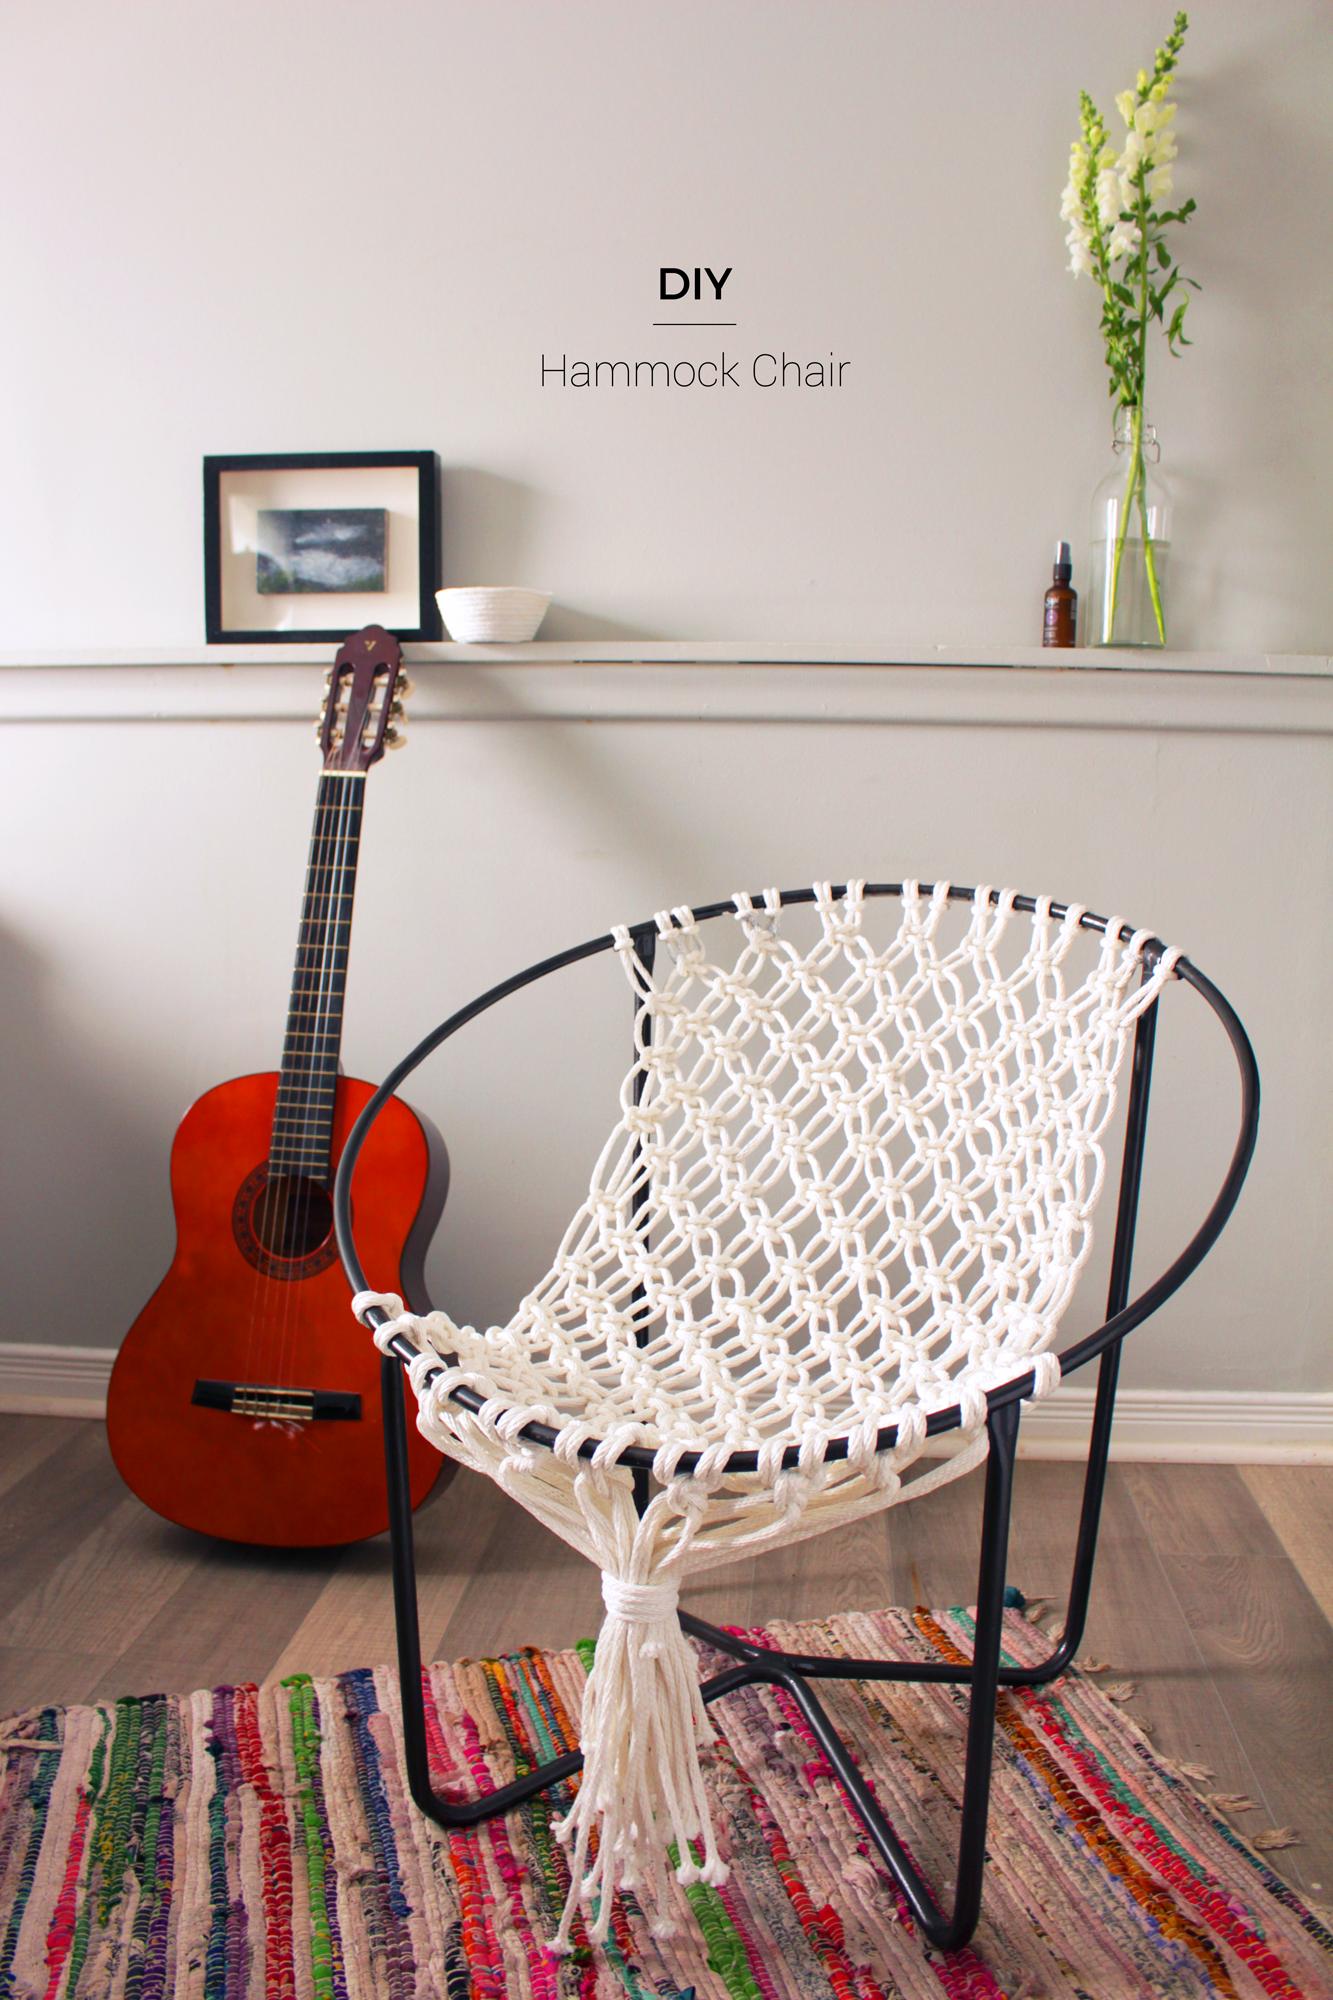 Diy macrame hammock chair diy pinterest hammock chair comfy